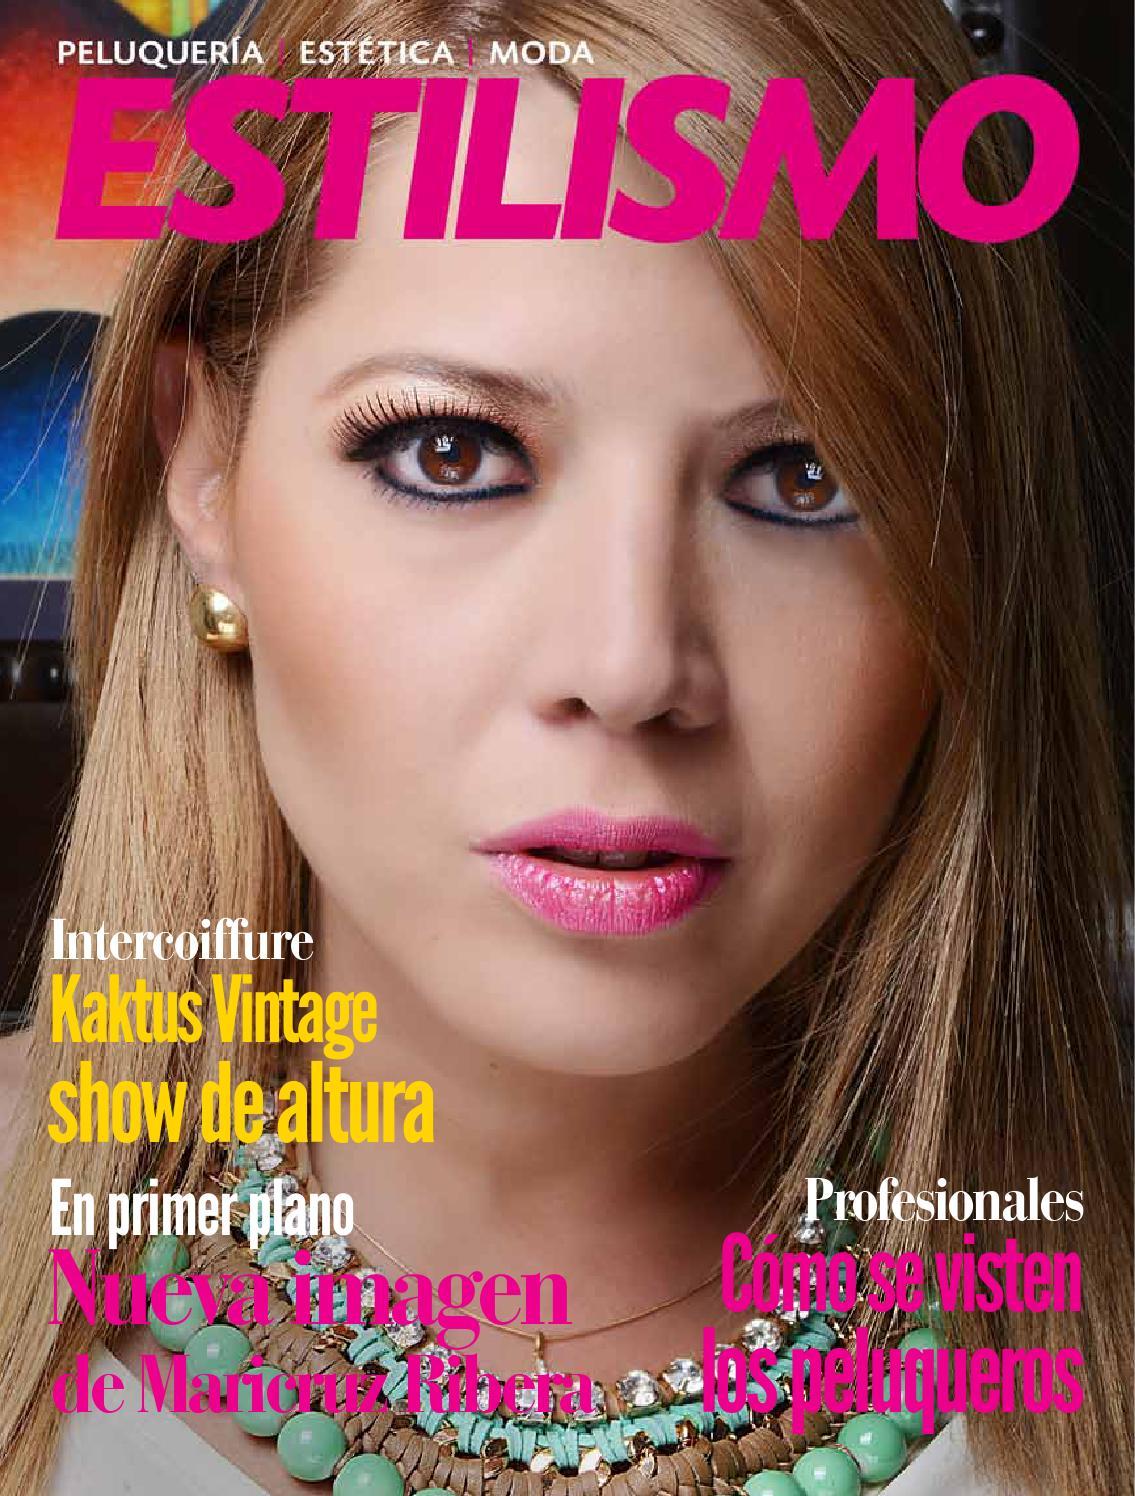 Revista Estilismo # 23 by Estilismo Peluquería Estética Moda - issuu